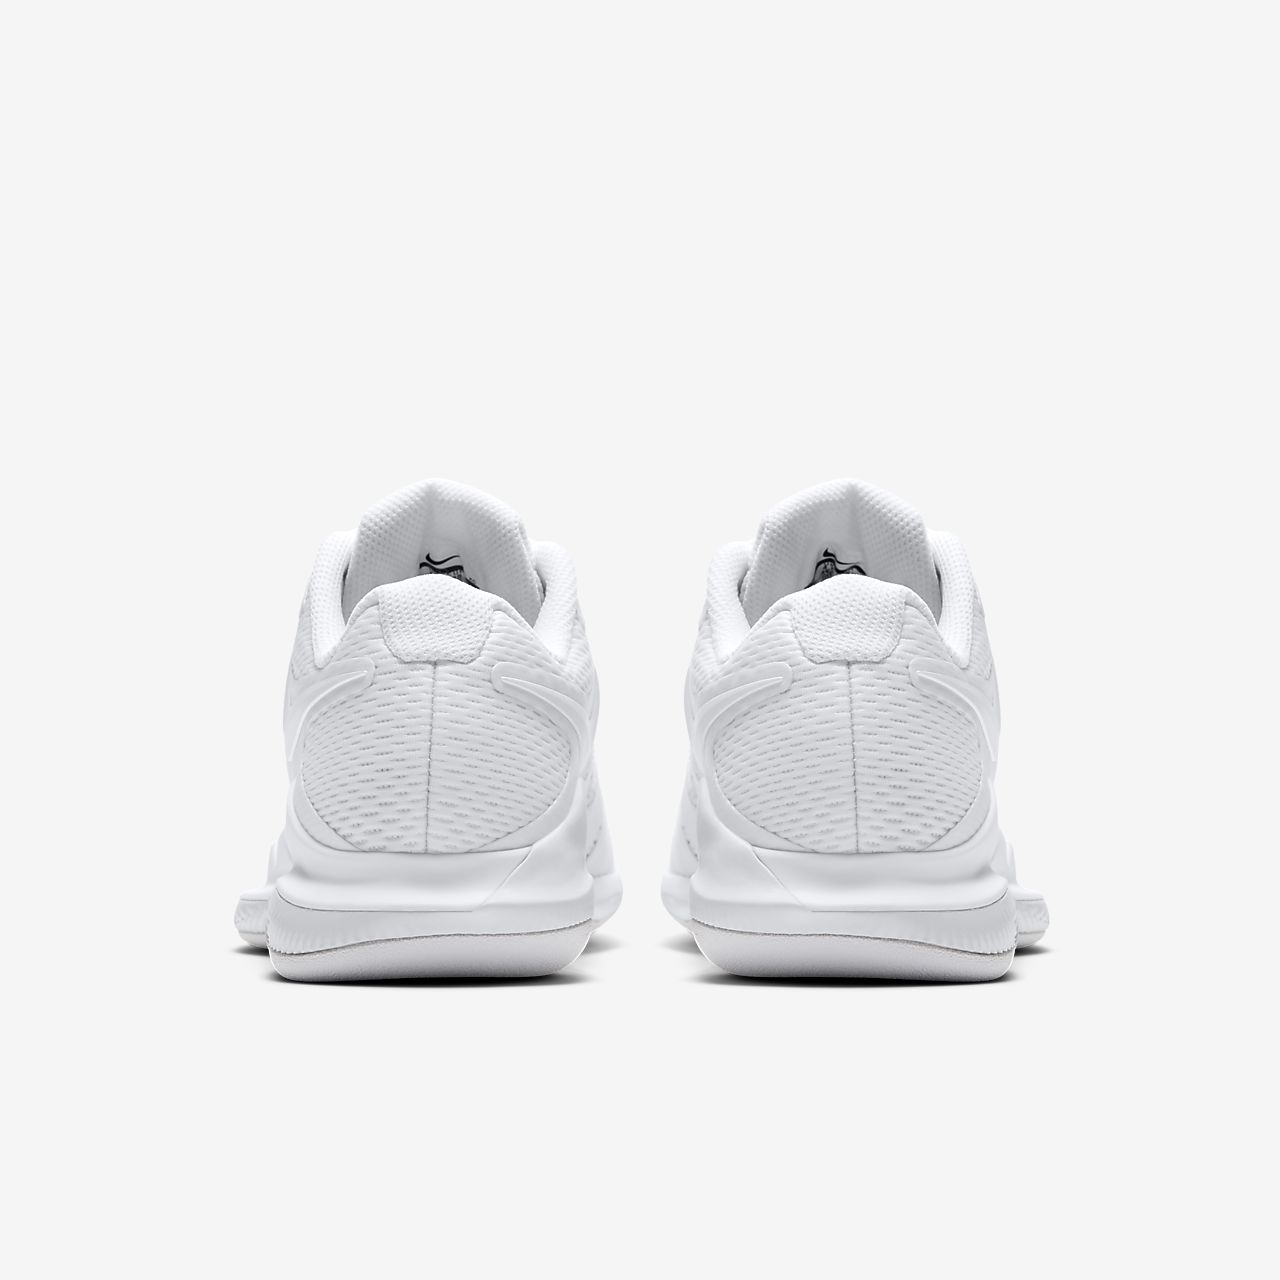 95ddf9868b Chaussure de tennis Nike Air Zoom Vapor 10 Carpet pour Femme. Nike ...